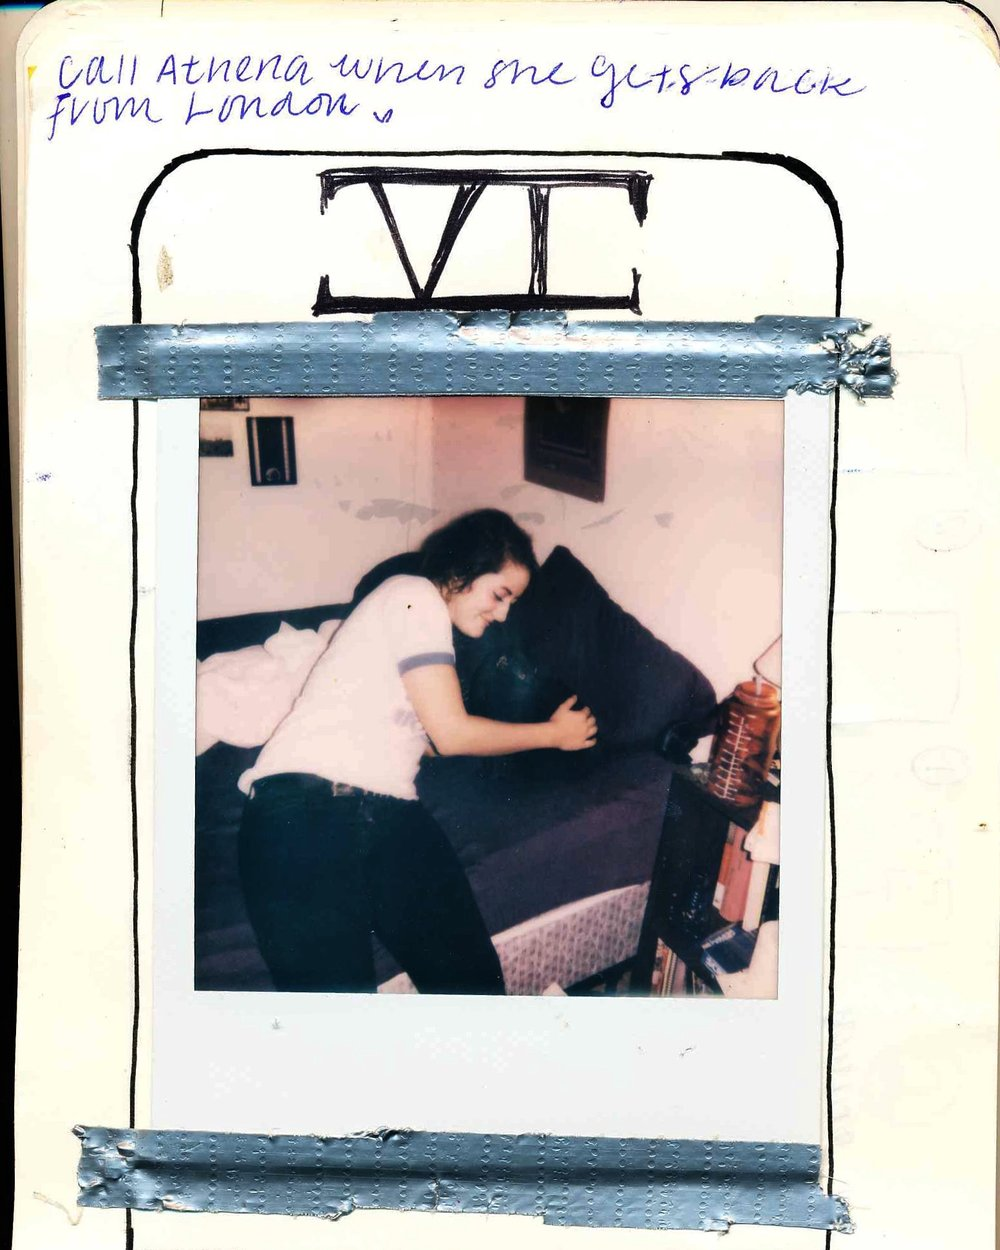 vain-vvitch-semi-zine-photography-submission-image-2.JPG